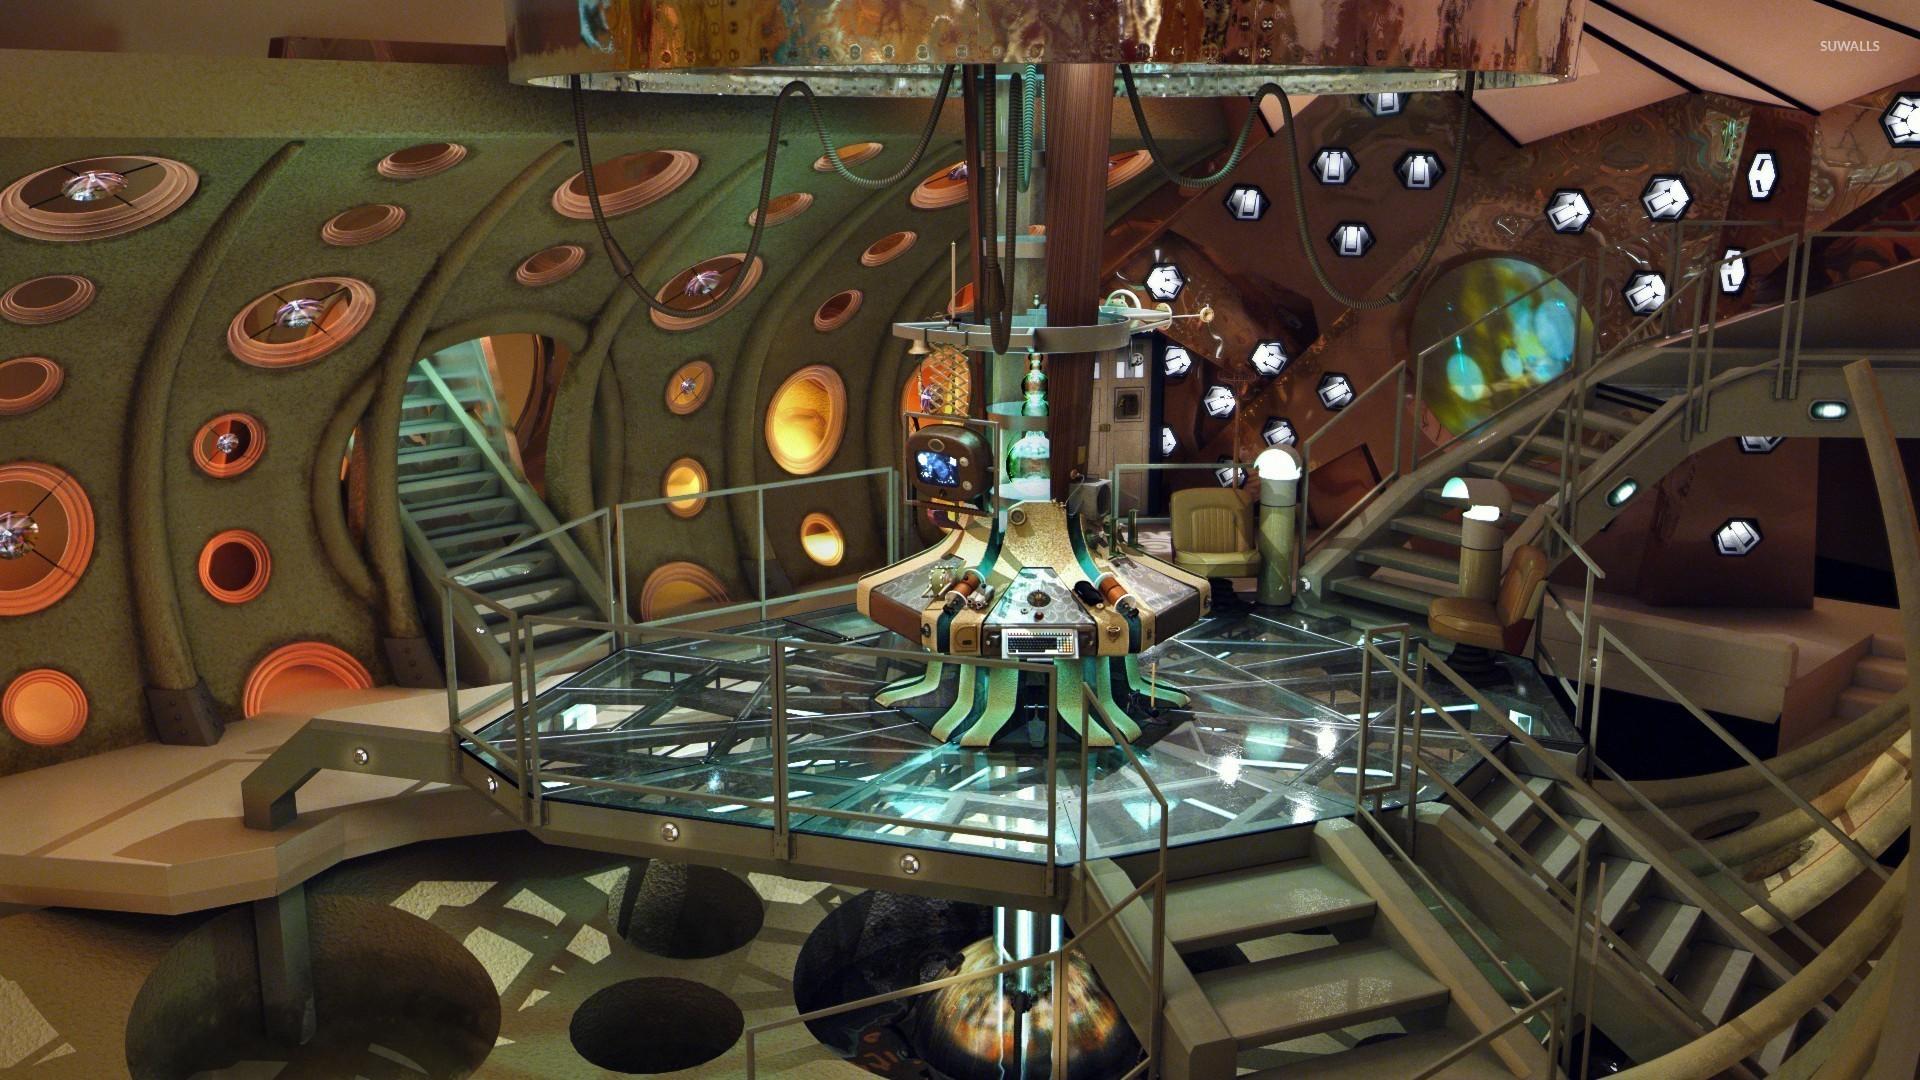 TARDIS – Doctor Who wallpaper